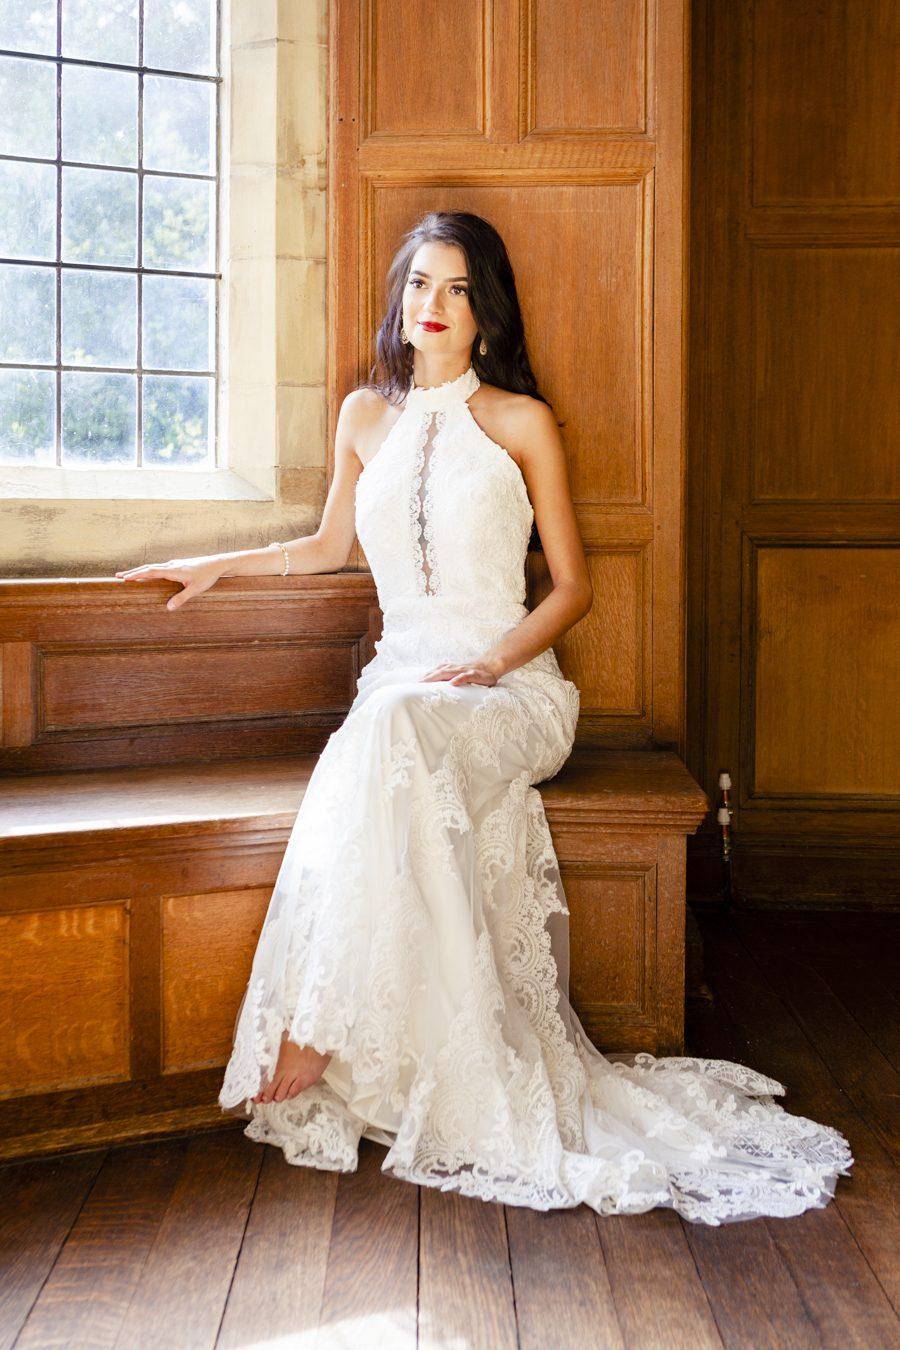 Old Hollywood glamour wedding style at Balcombe Place, photographer Fiona Mills Art on English-Wedding.com (22)